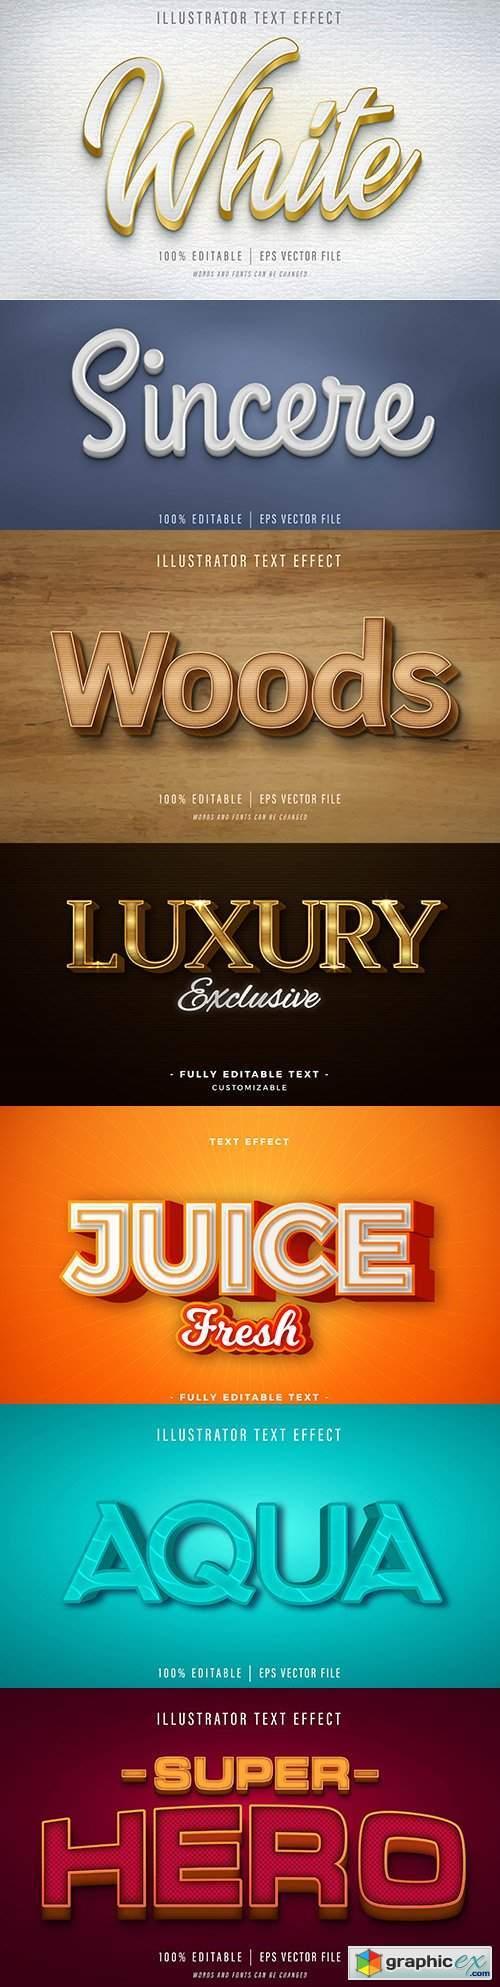 Editable font effect text collection illustration design 69